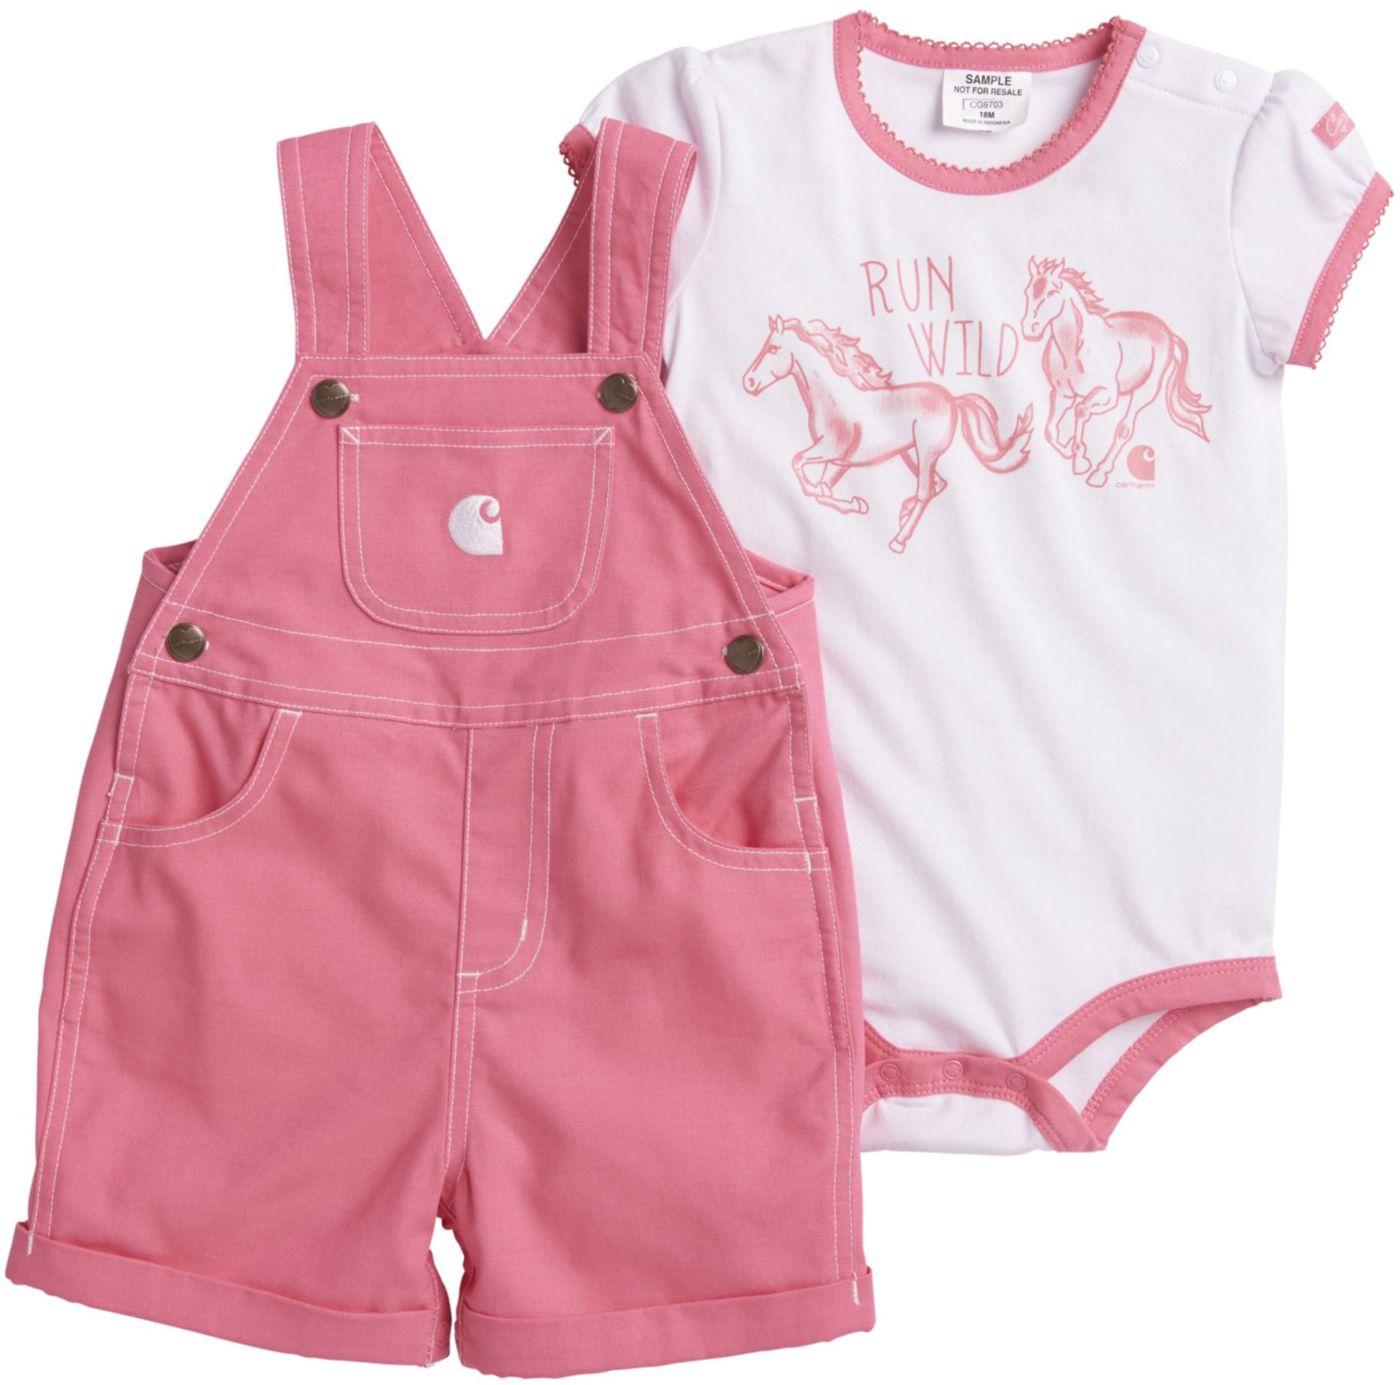 Carhartt Infant Girls' 2-Piece Onesie and Canvas Shortall Set